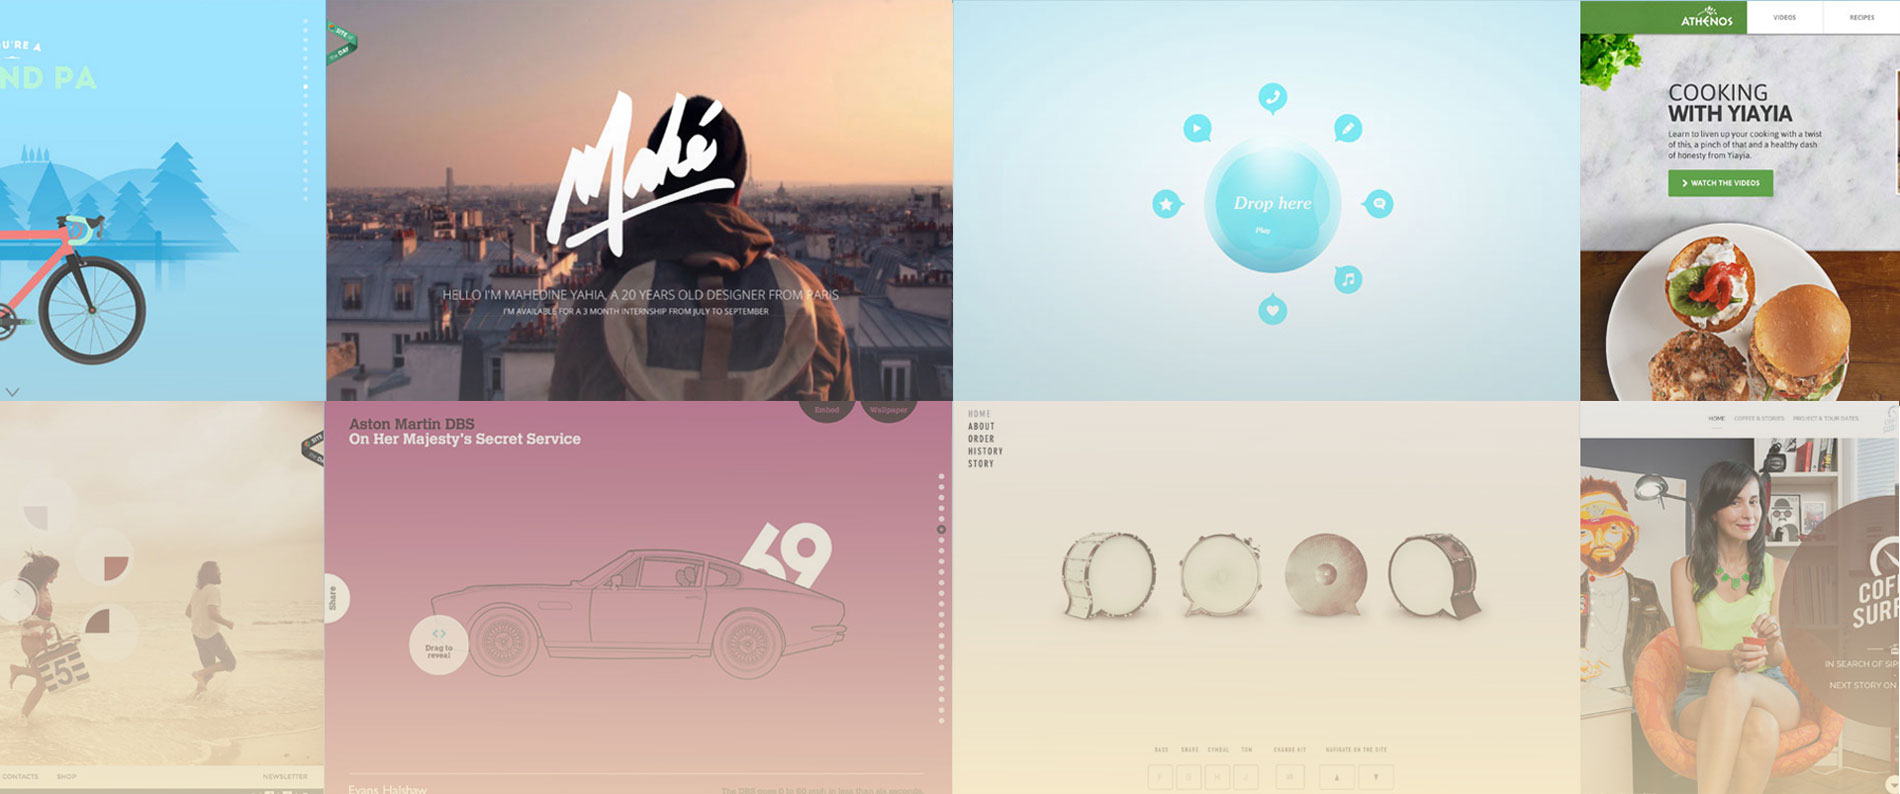 Design Trends Archives Web Designer Wall